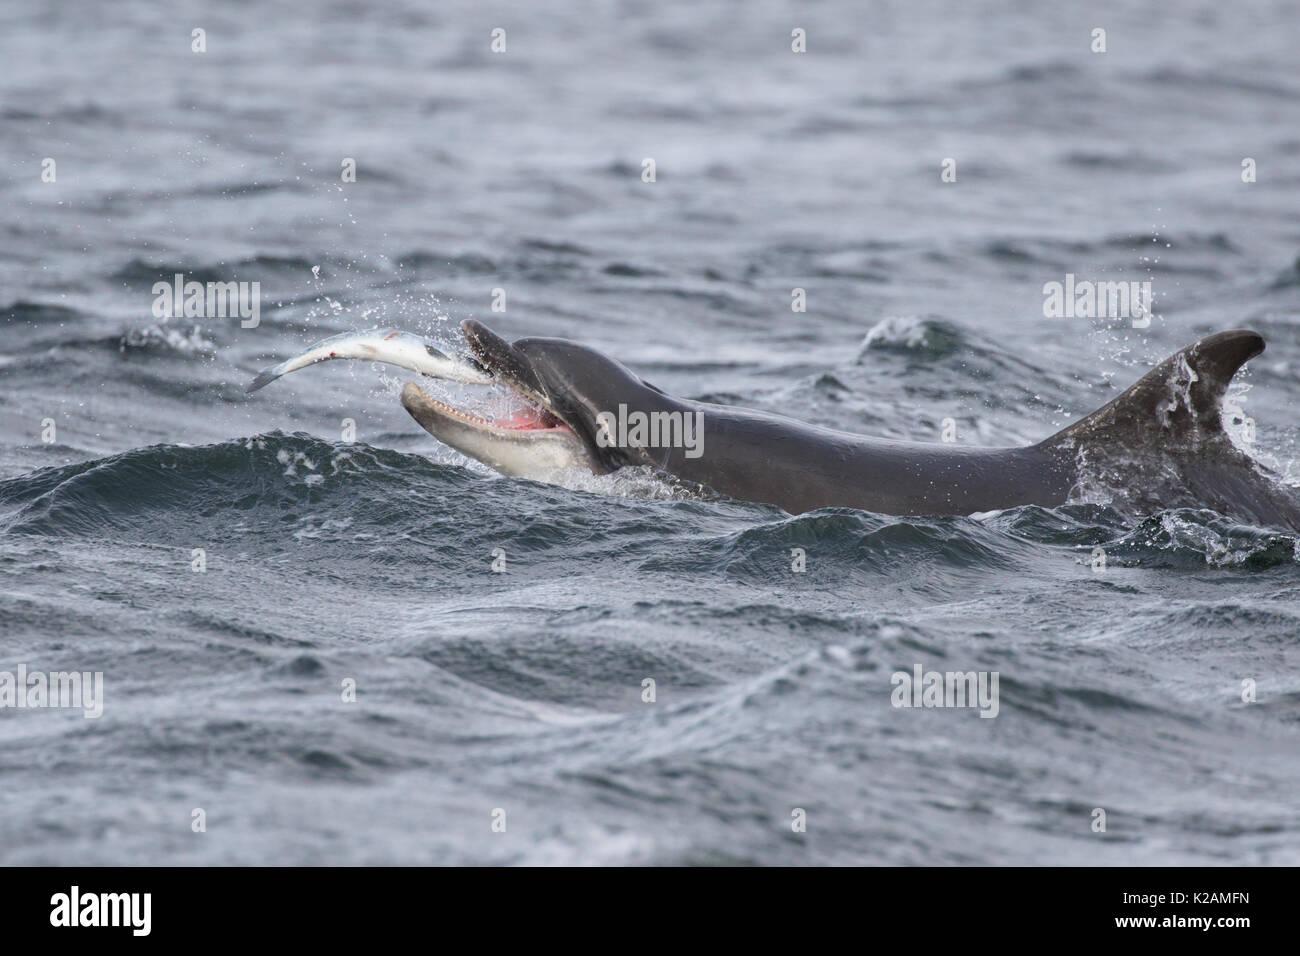 Bottlenose Dolphin (Tursiops truncatus) eating salmon (Salmo salar) in the Moray Firth, Chanonry Point, Scotland, UK - Stock Image